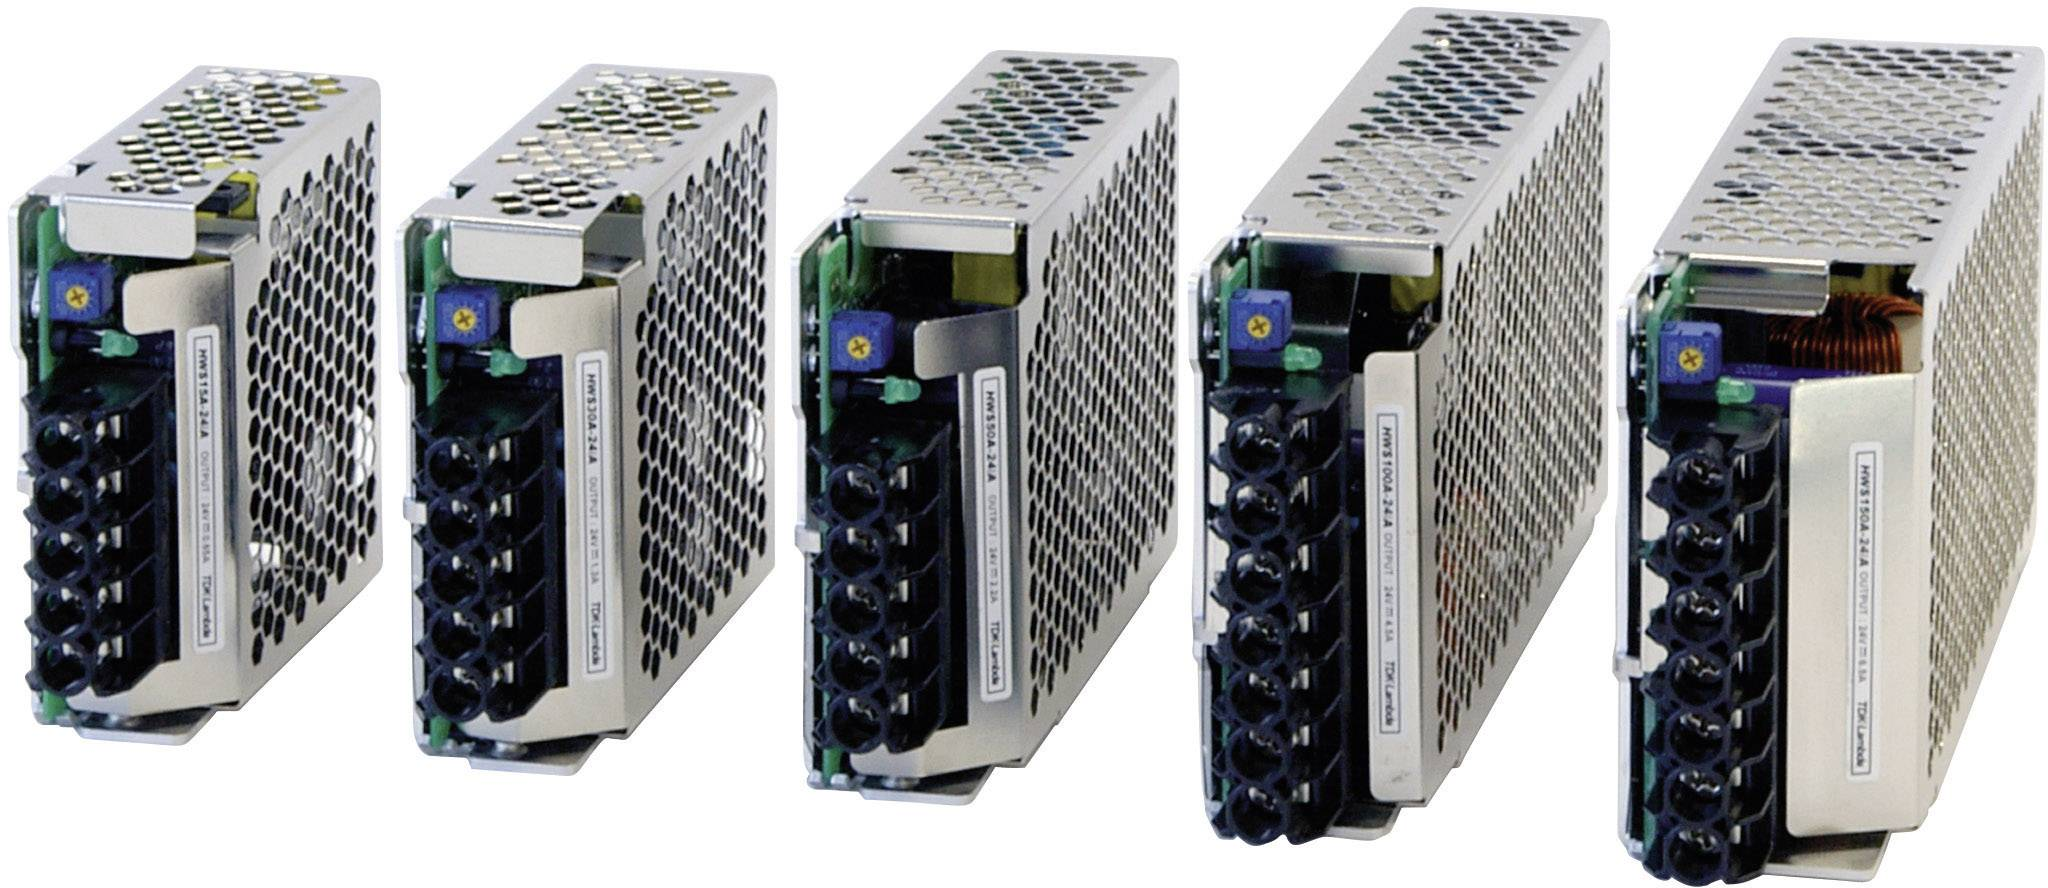 Zabudovateľný napájací zdroj TDK-Lambda HWS-150A-12/A, 12 V, 156 W